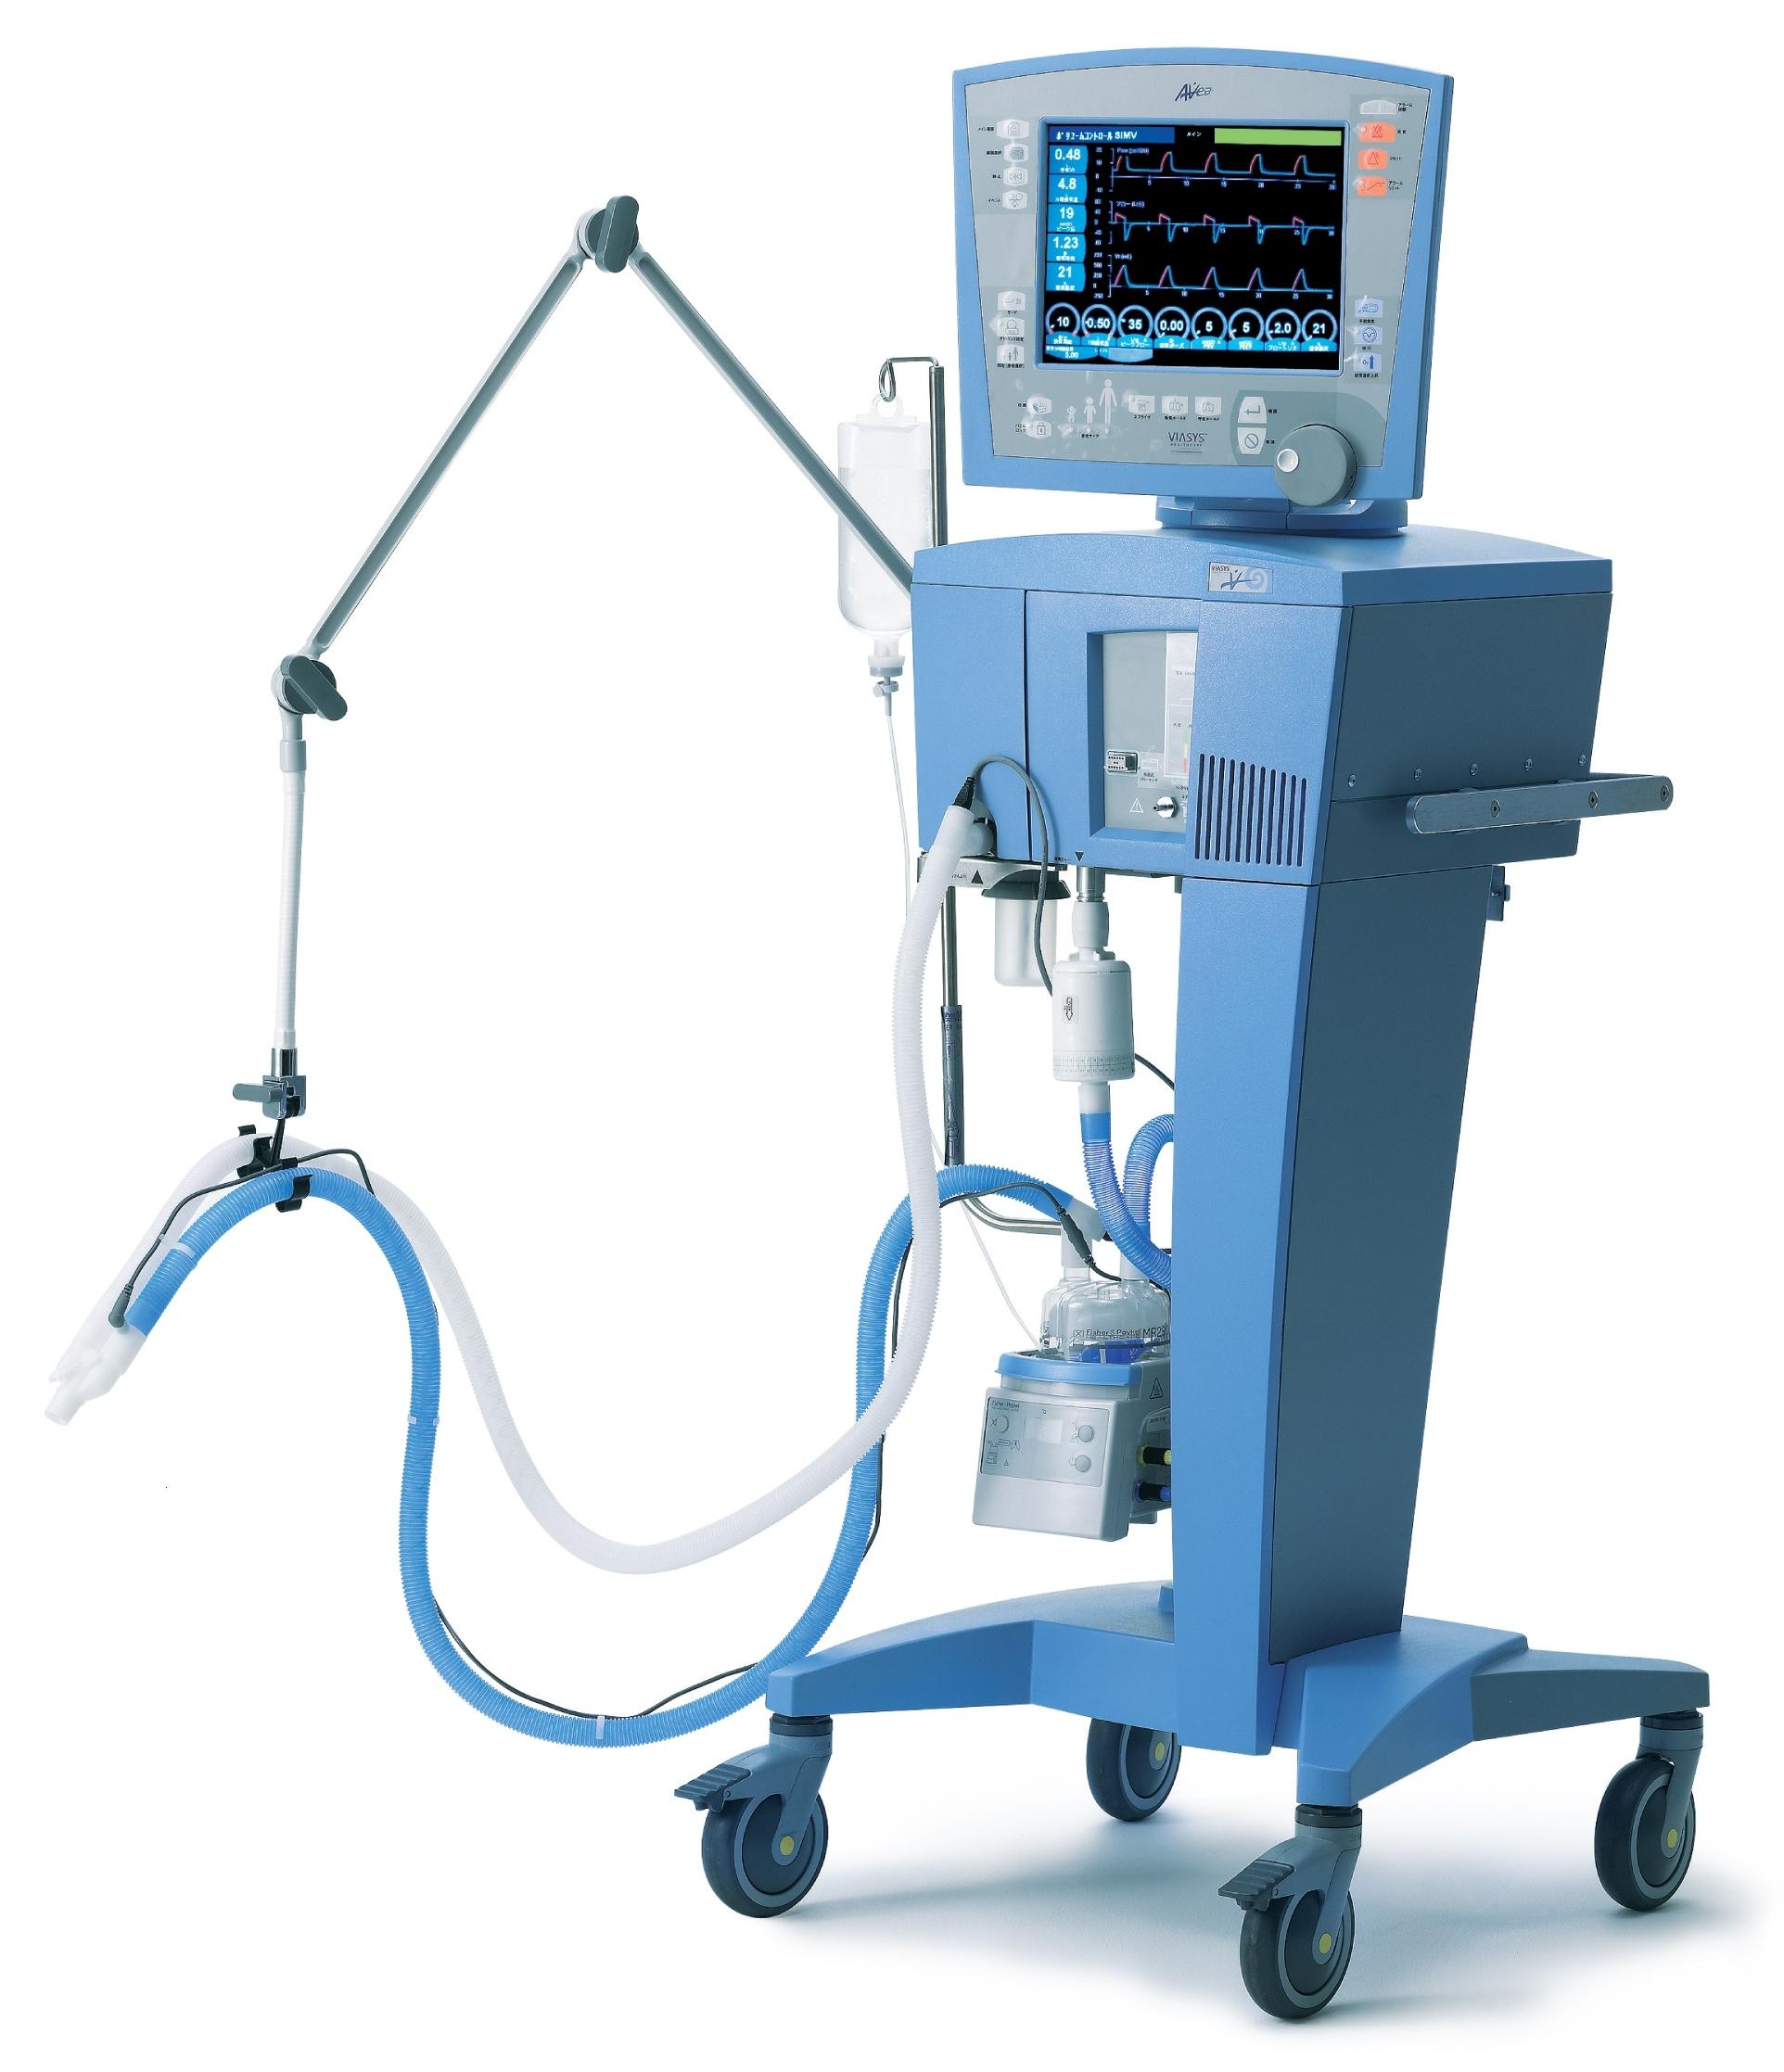 Avea Ventilator Carefusion  Share The Knownledge